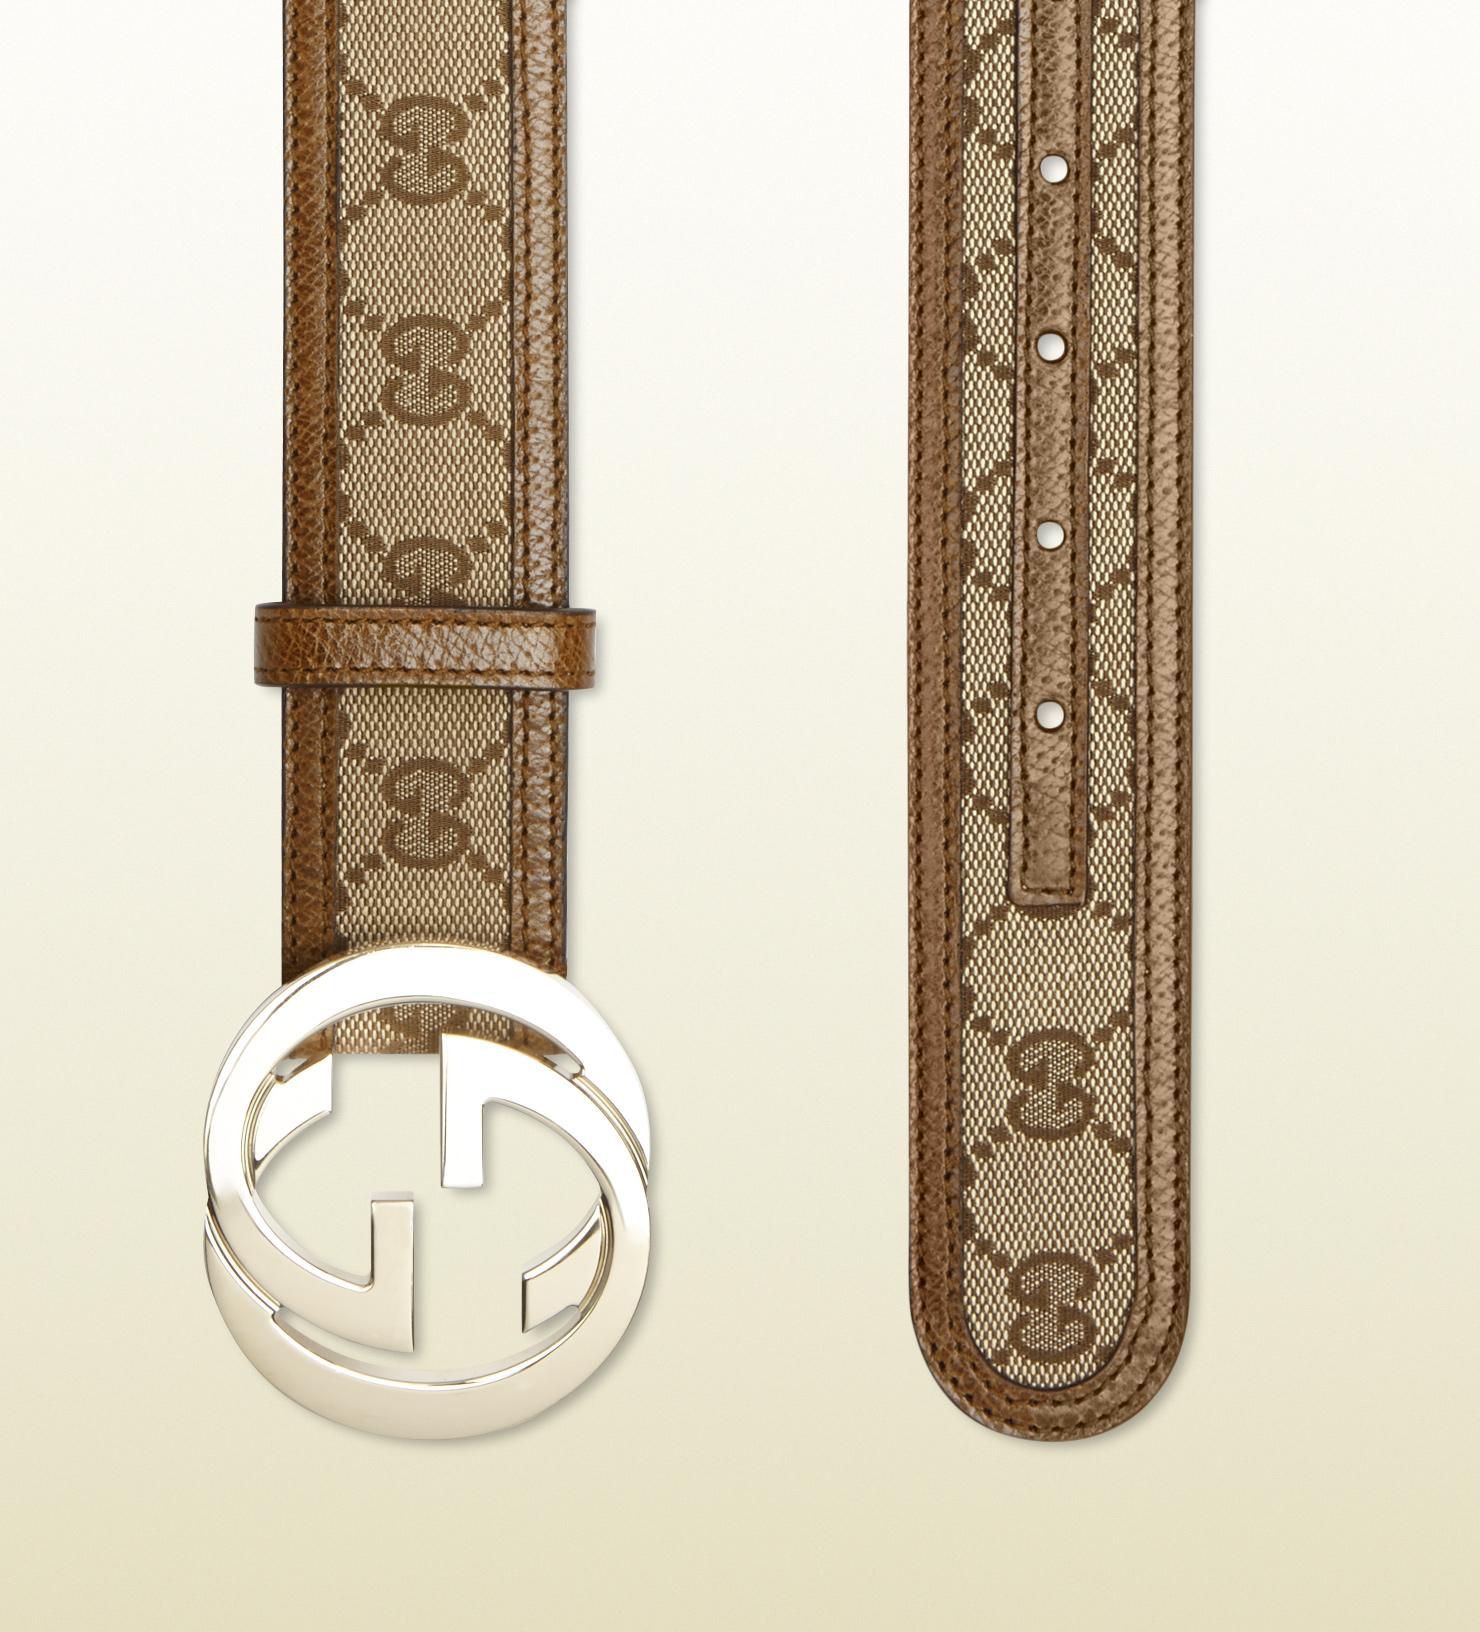 54a2001792c41 Lyst - Gucci Original Gg Canvas Belt With Interlocking G Buckle in ...